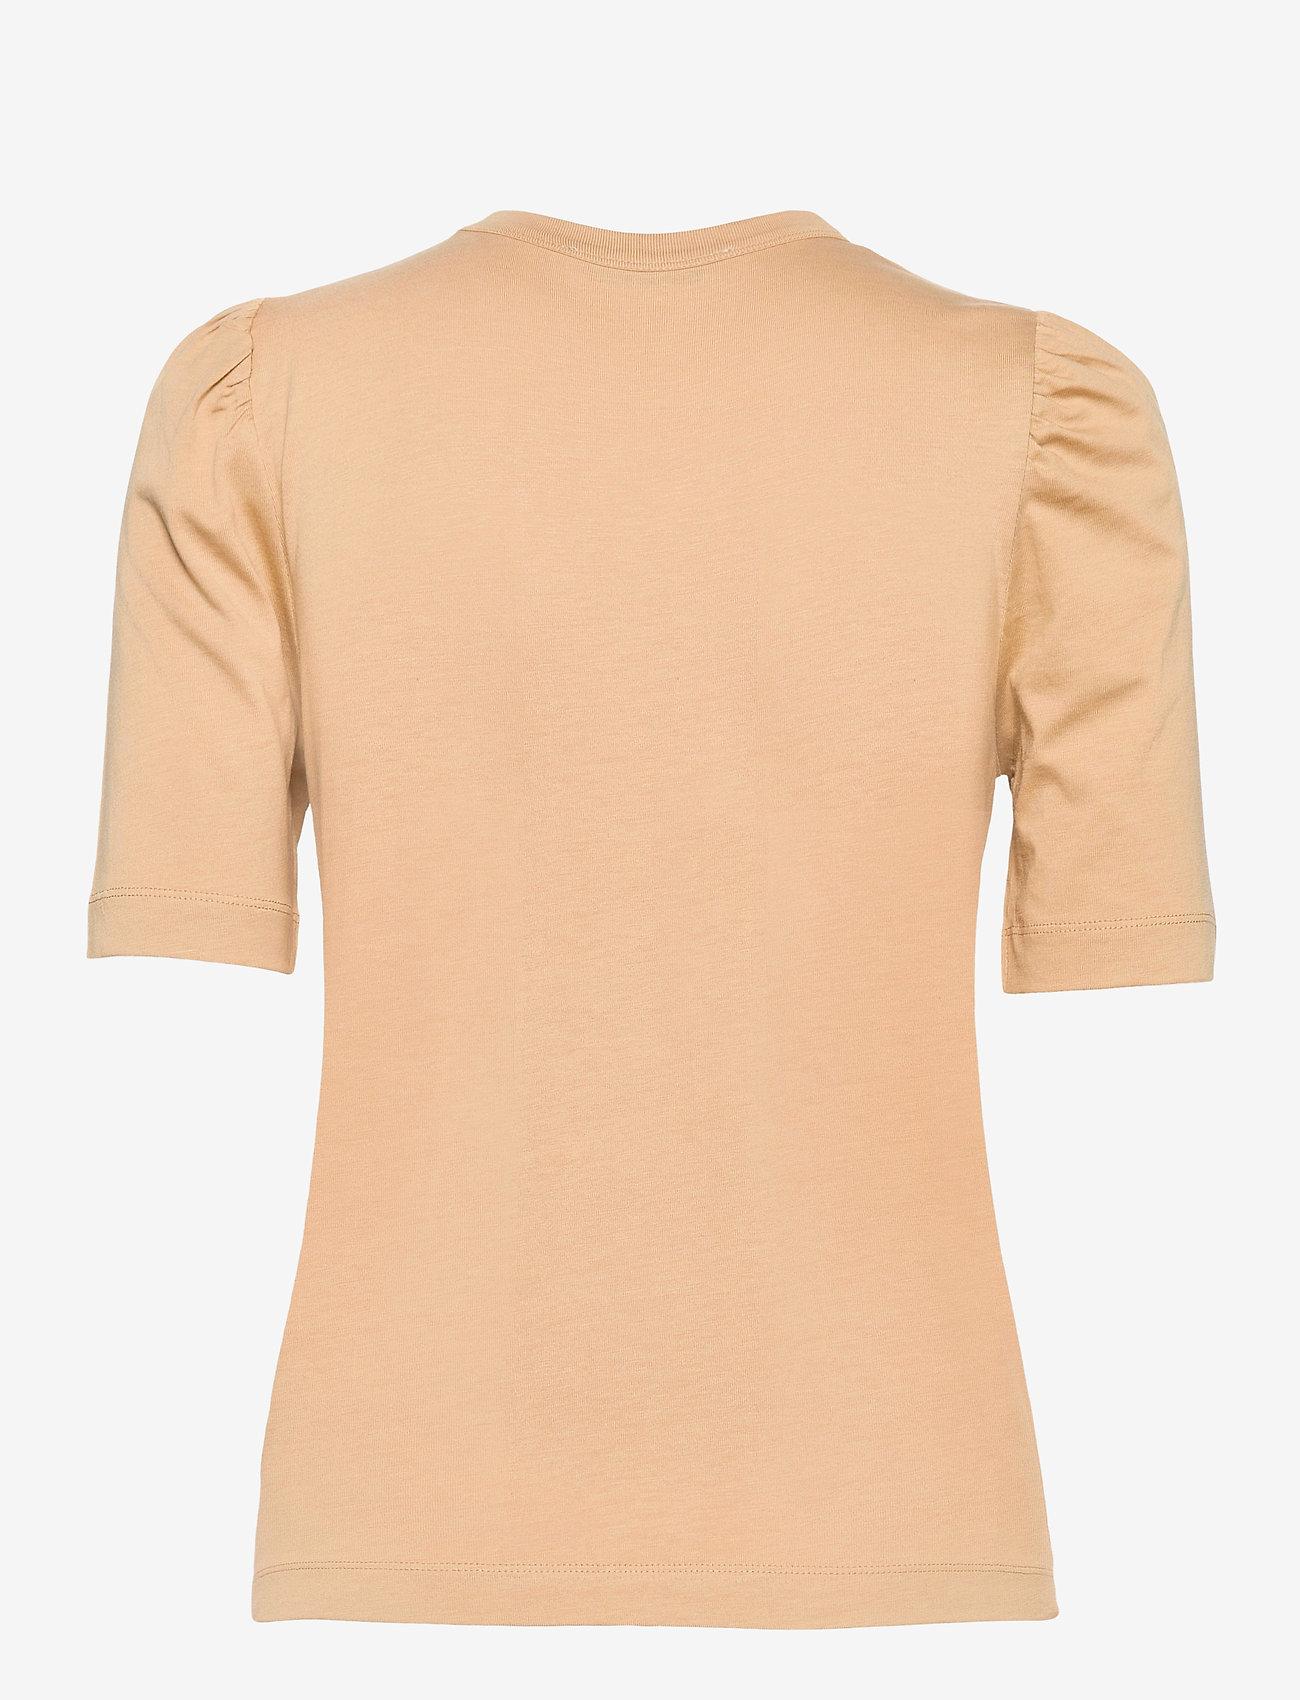 RODEBJER - RODEBJER DORY - t-shirts - camel - 1